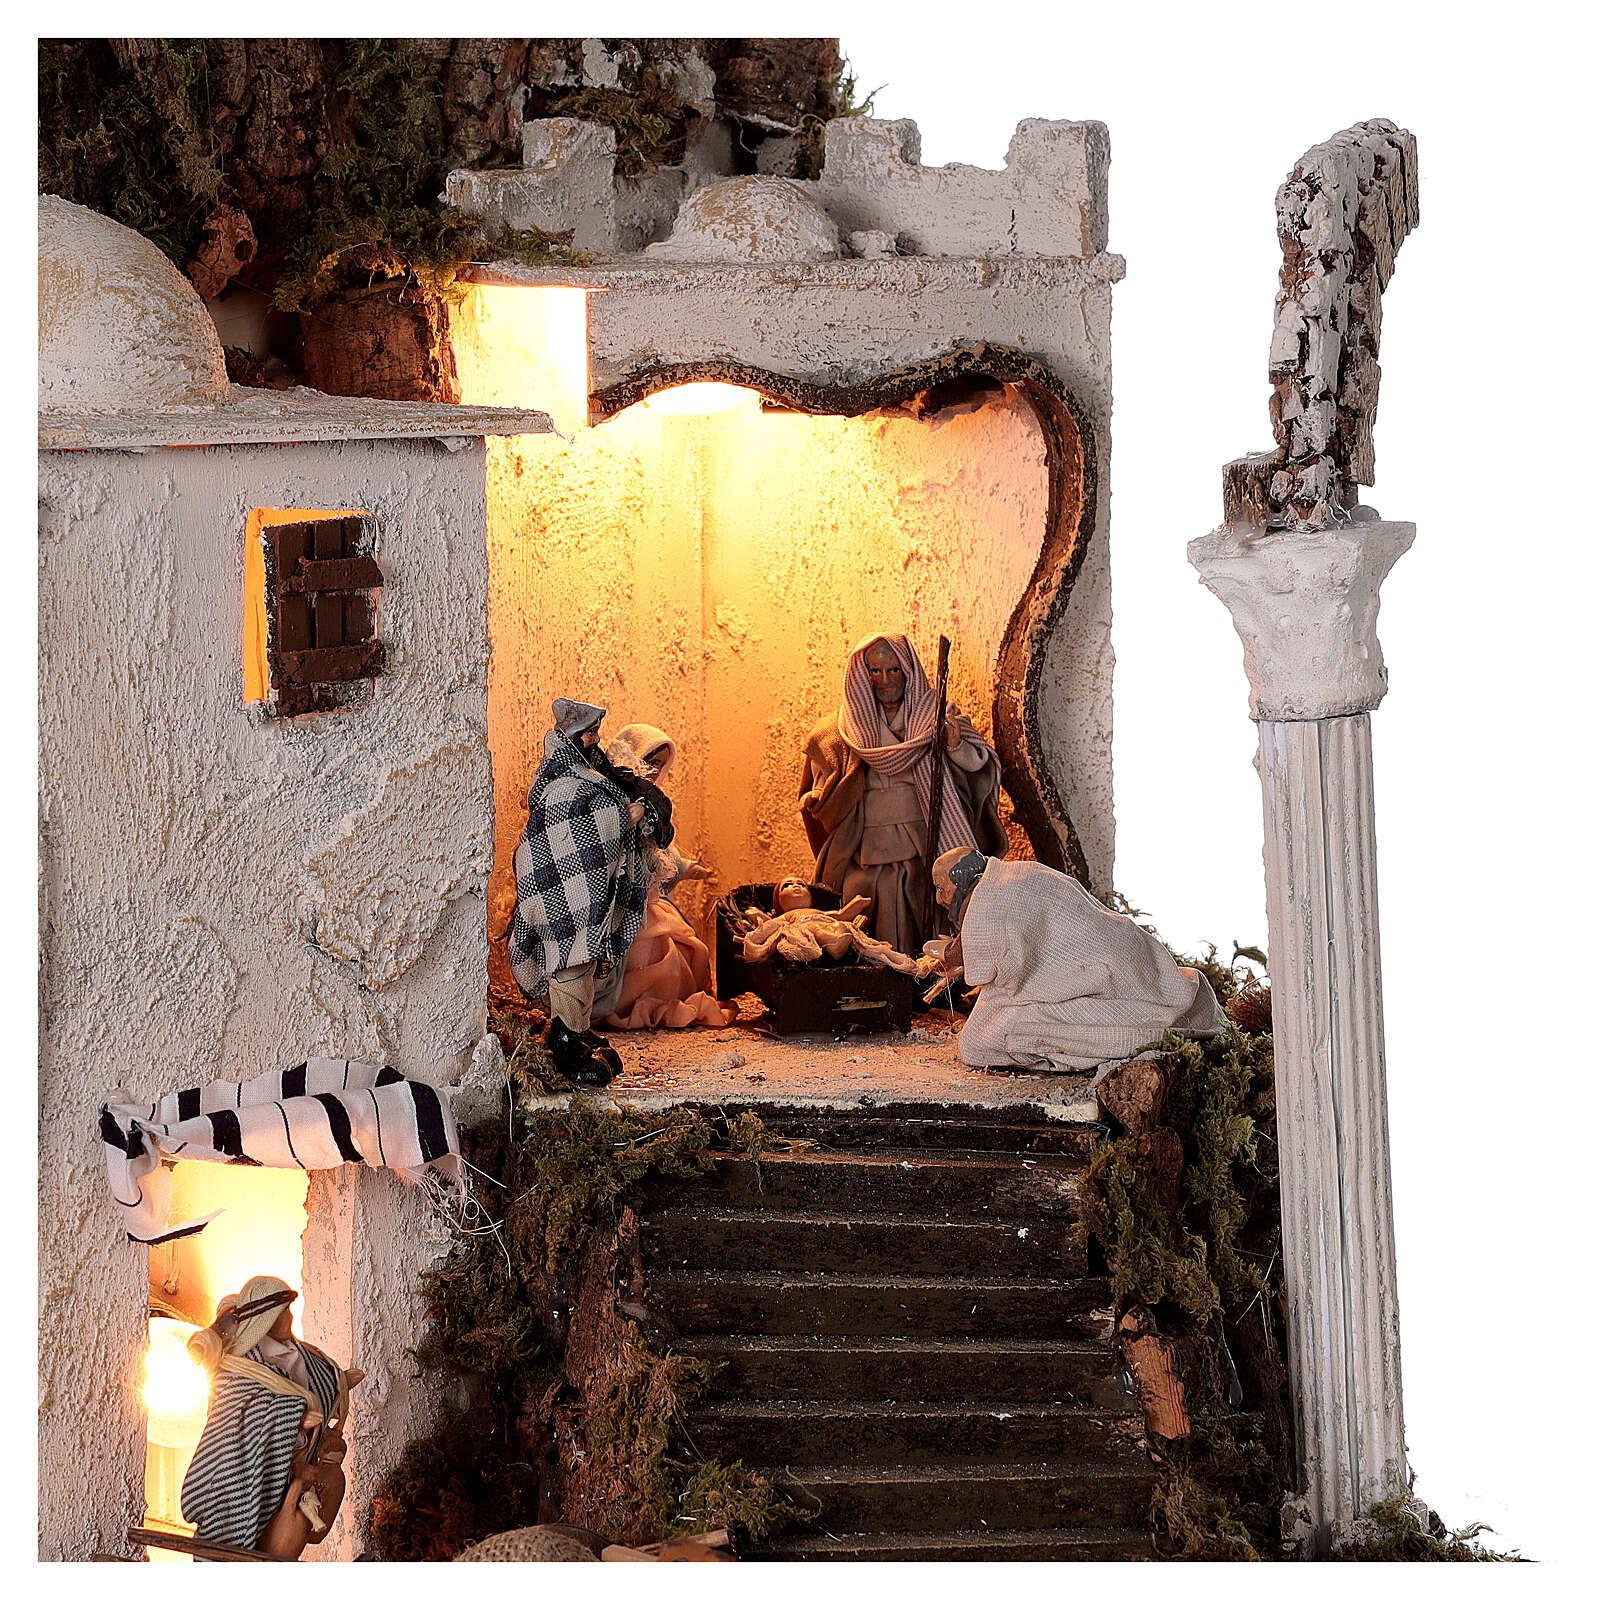 Arab village illuminated (B) Holy Family and shepherds of 8 cm for Neapolitan Nativity Scene 40x35x35 cm 4